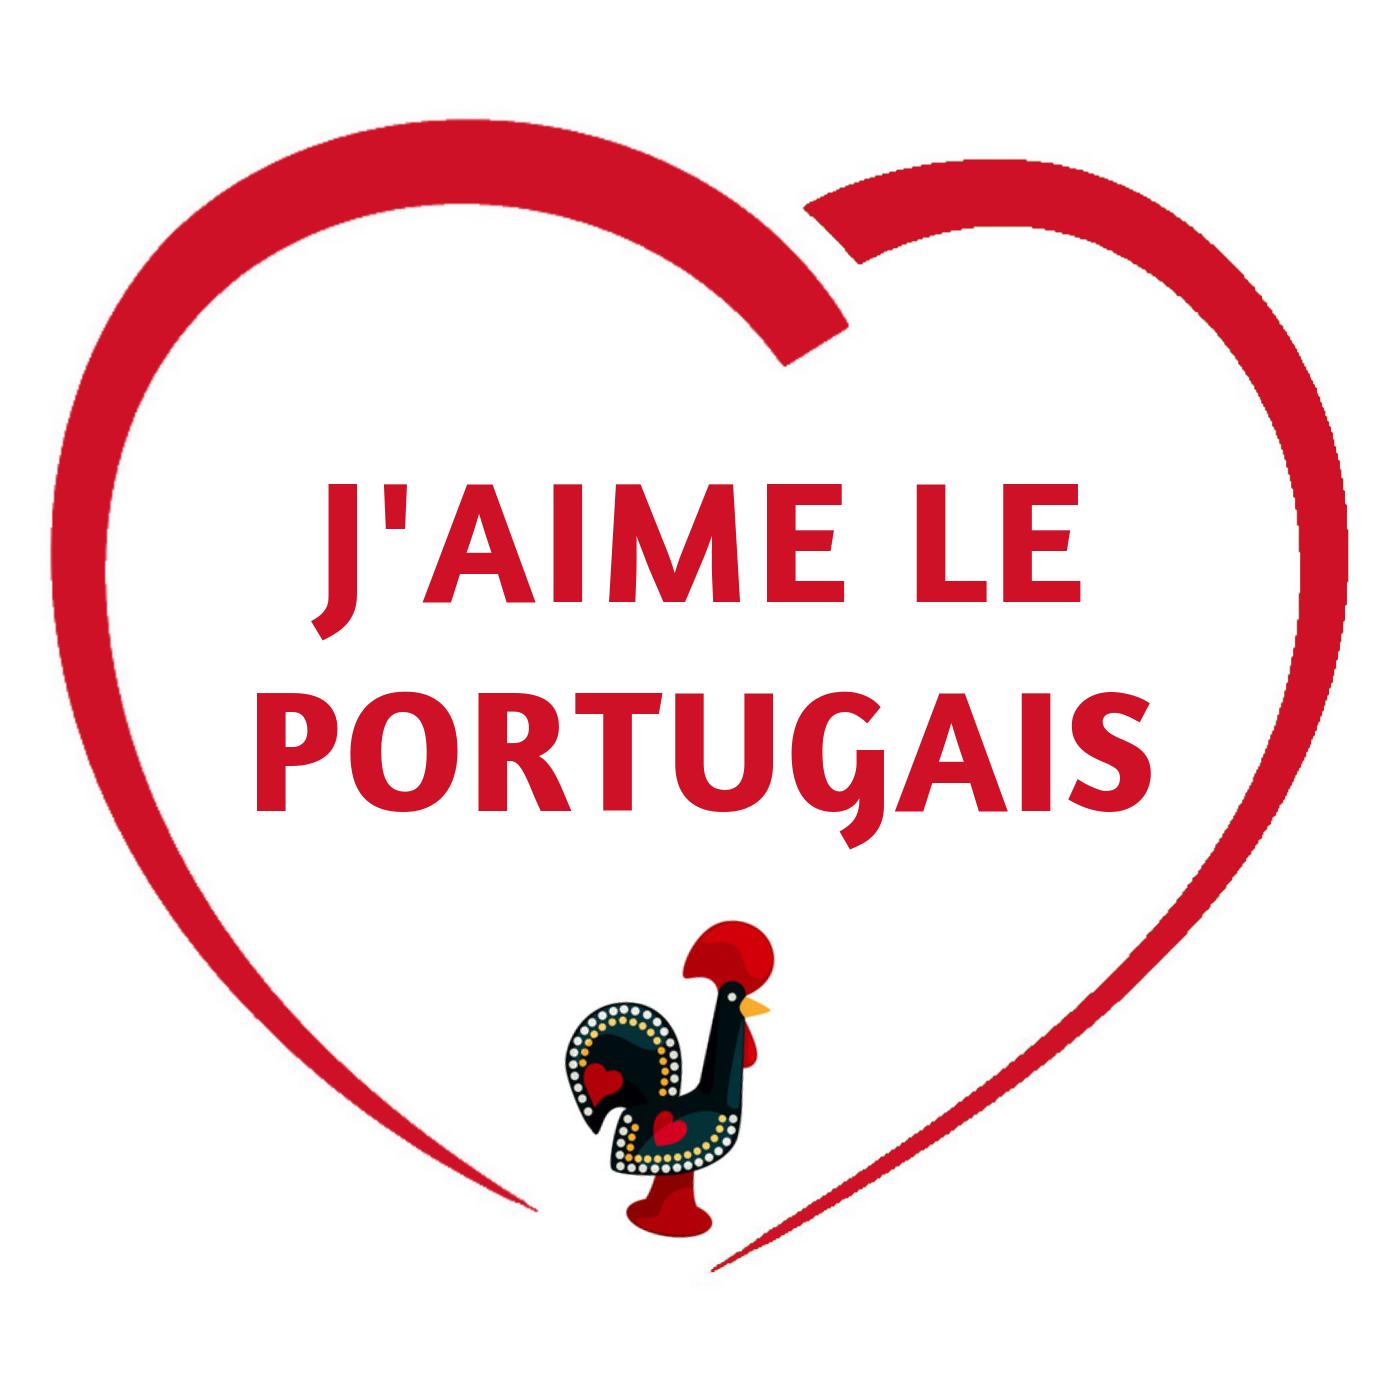 J'aime le portugais